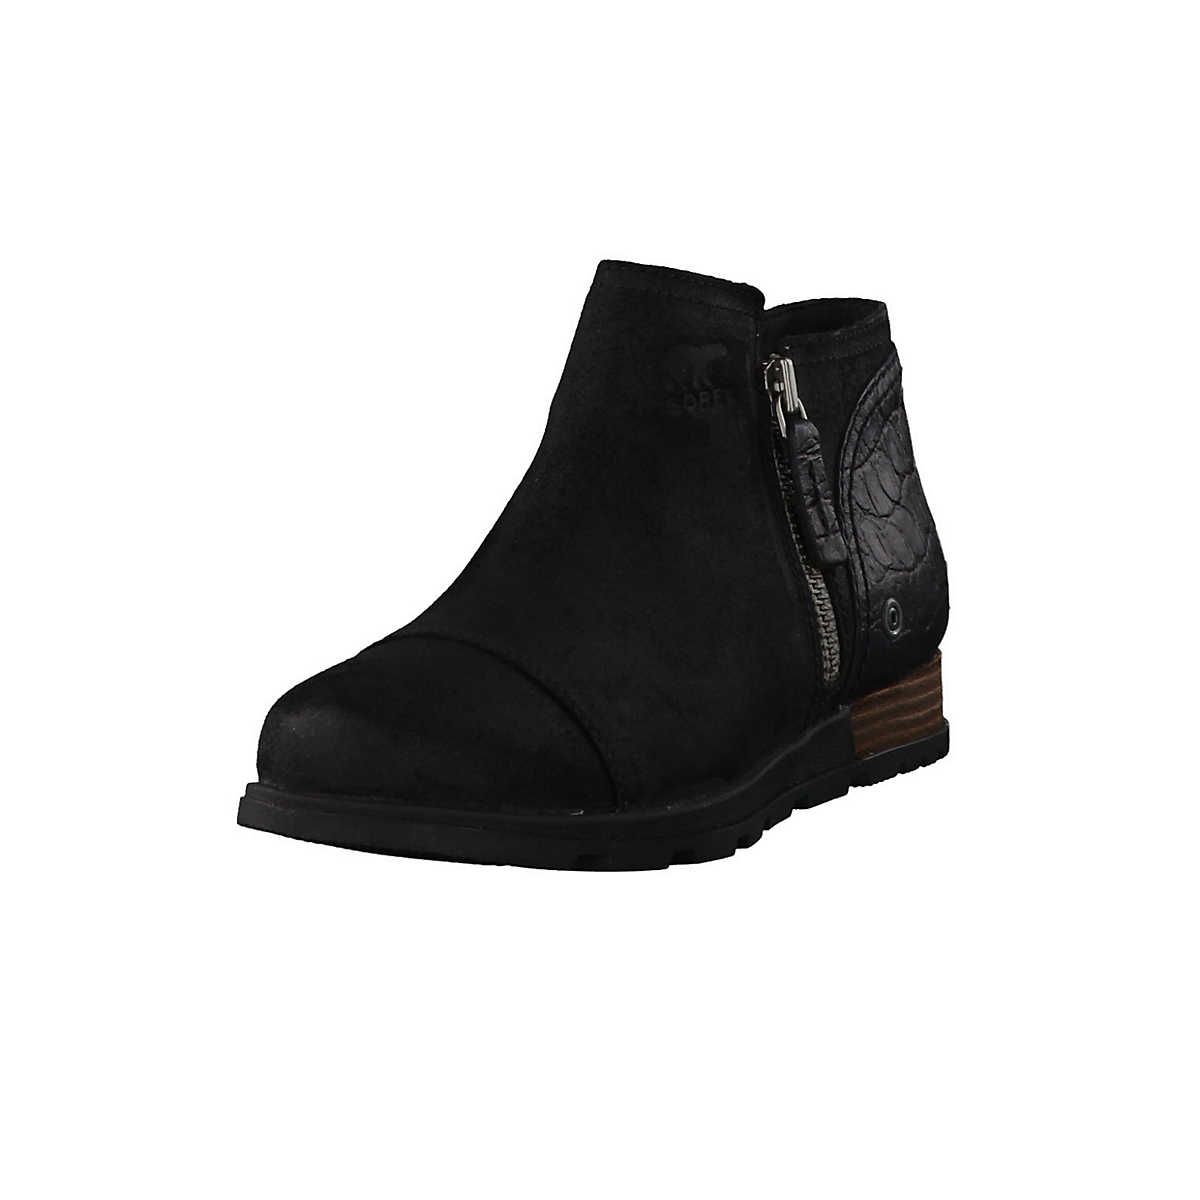 SOREL Stiefel schwarz - SOREL - Stiefeletten - Schuhe - mirapodo.de